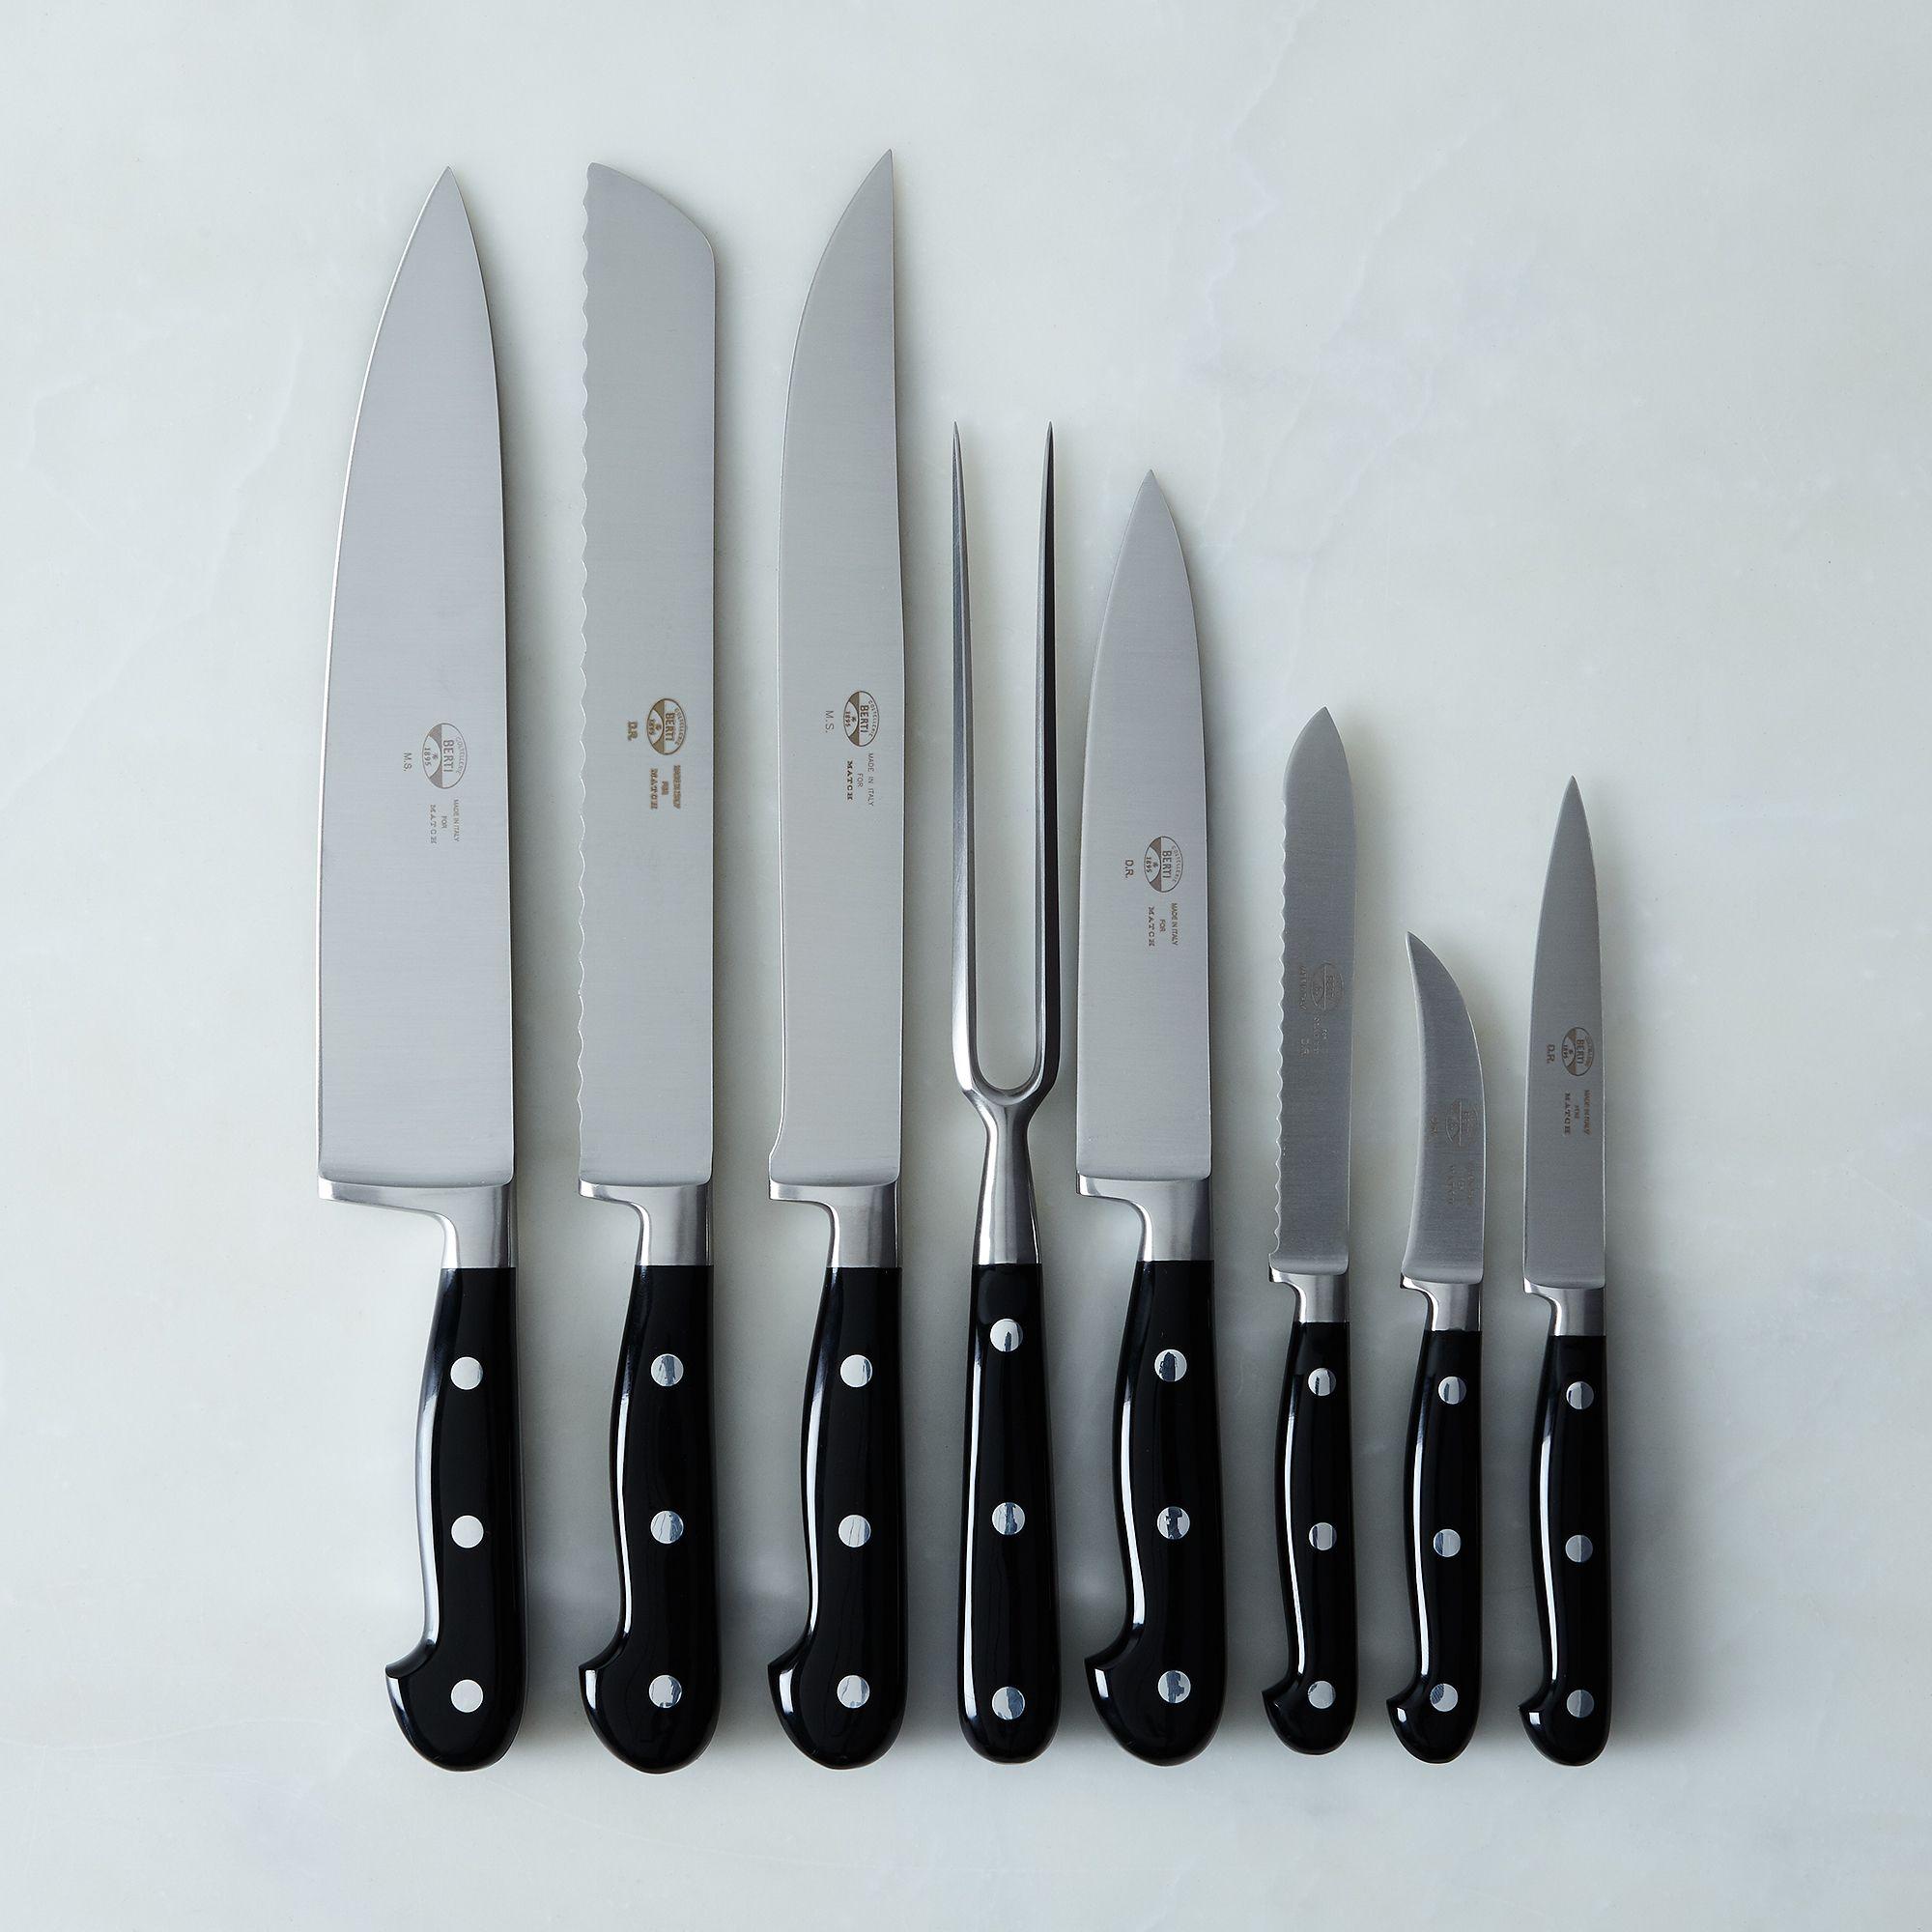 Berti Black-Handled Italian Kitchen Knives on Food52